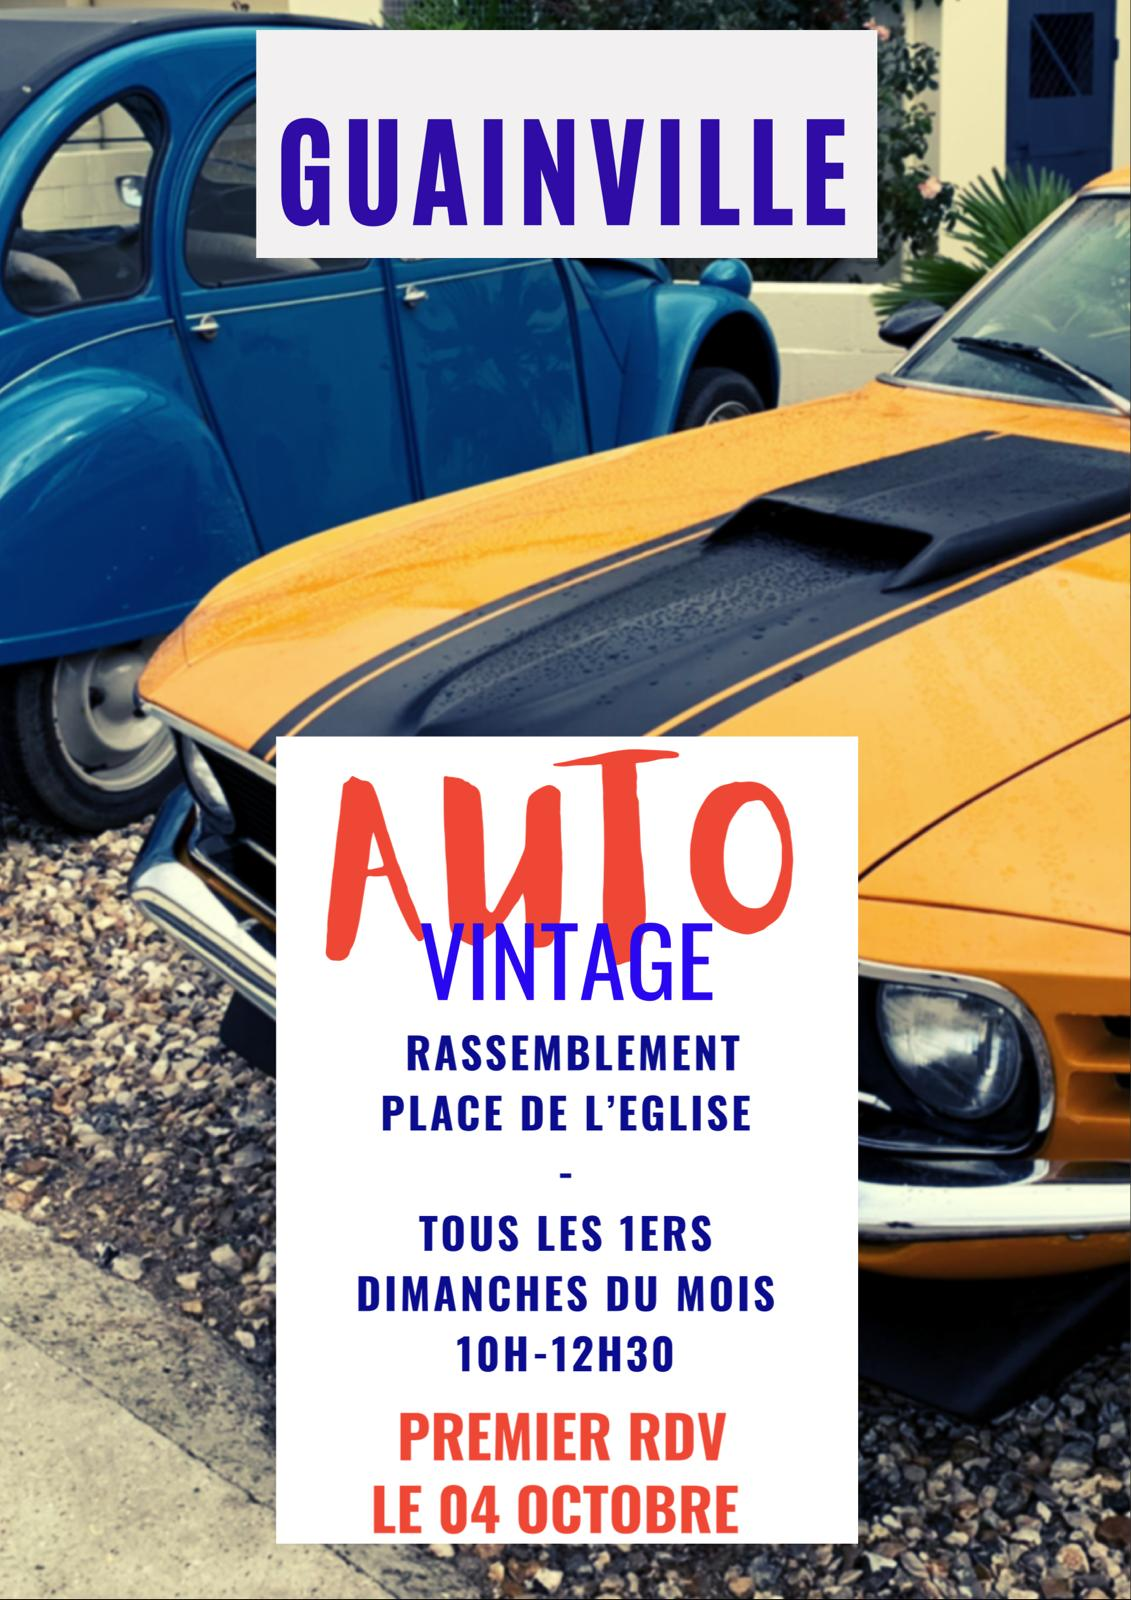 expo autos vintage